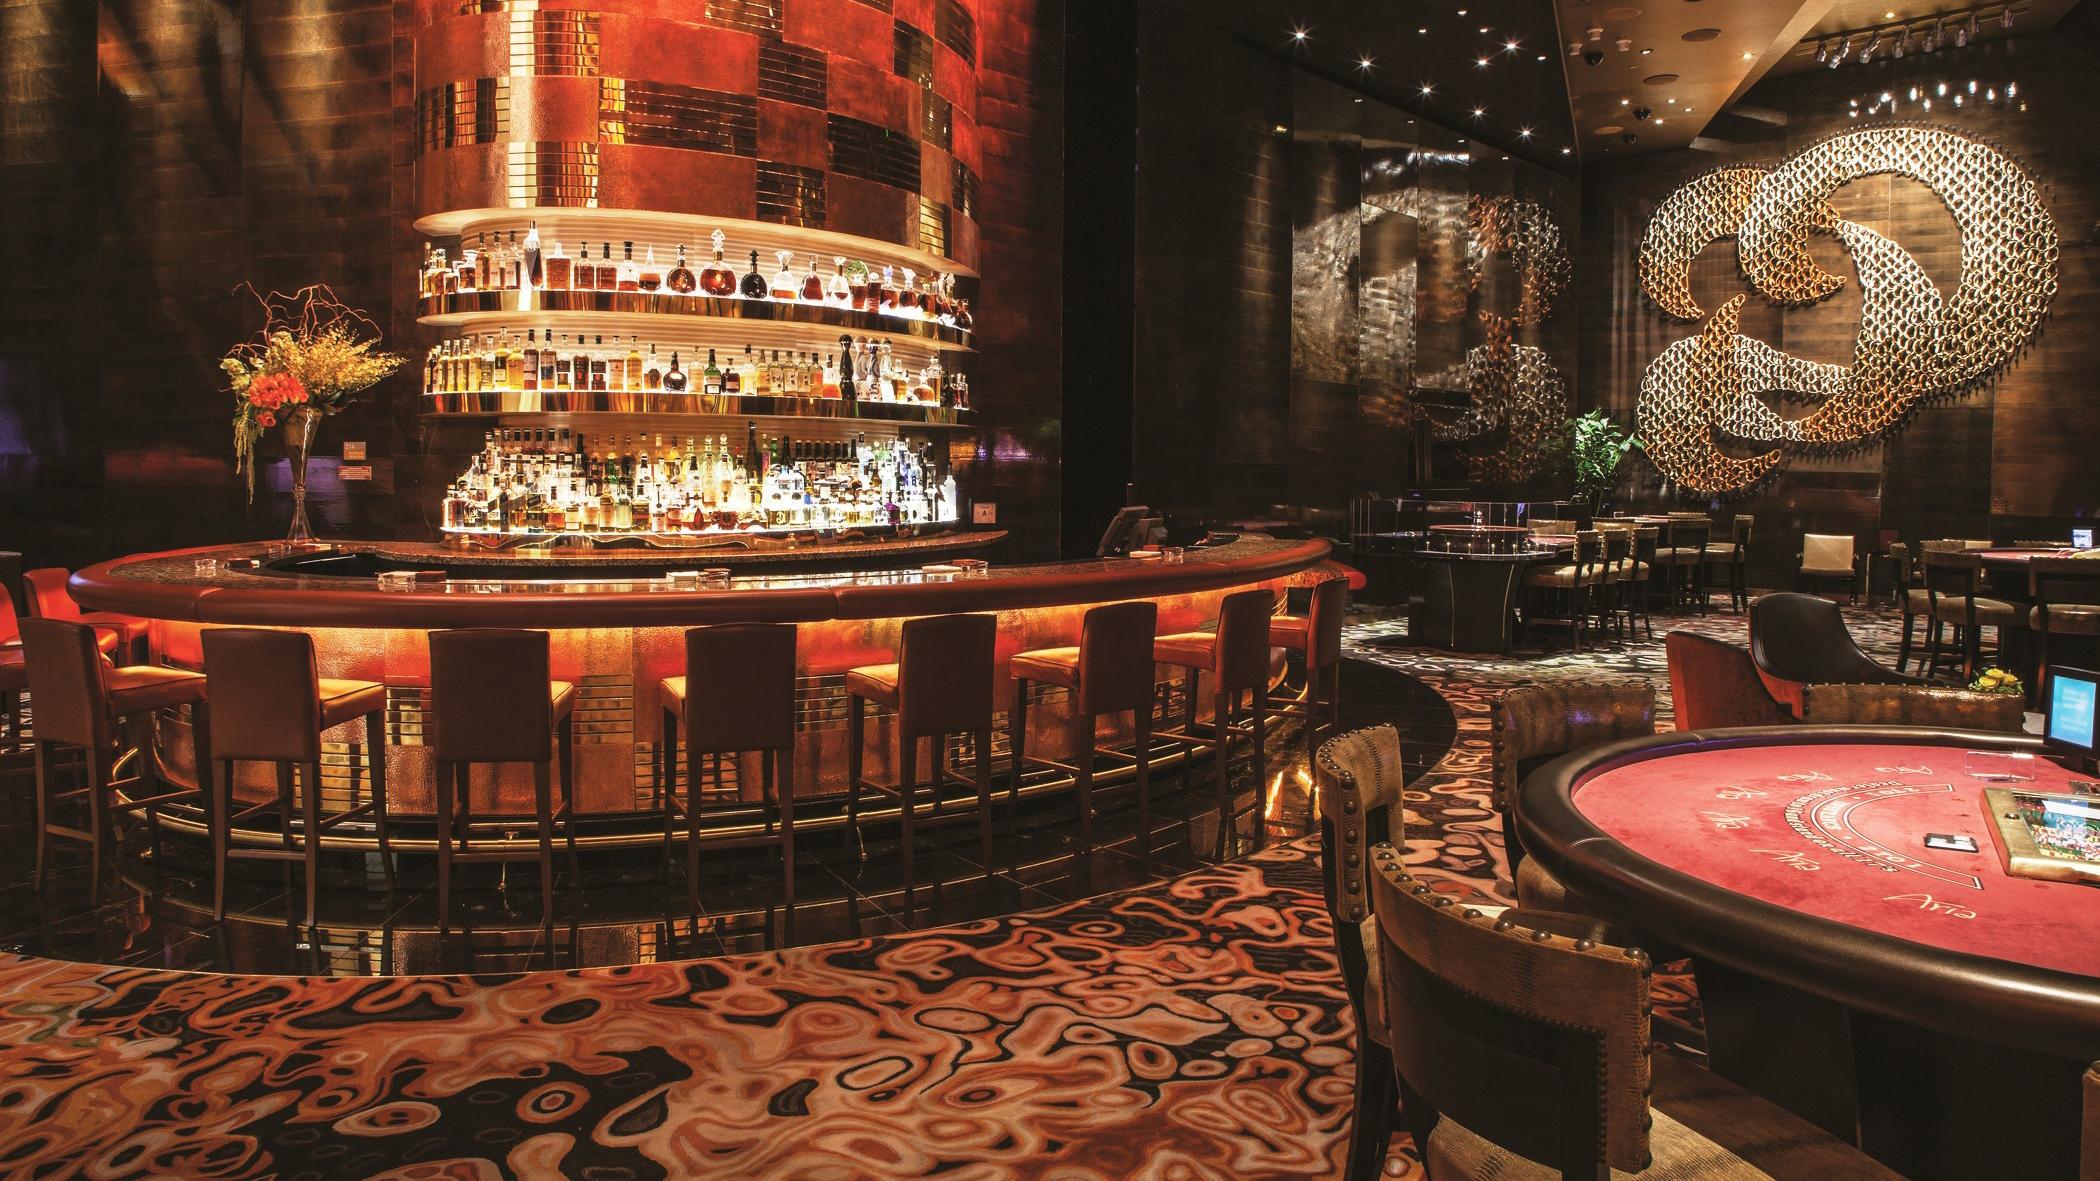 Pamiętniki z wakacji 180413130339-02-las-vegas-casinos